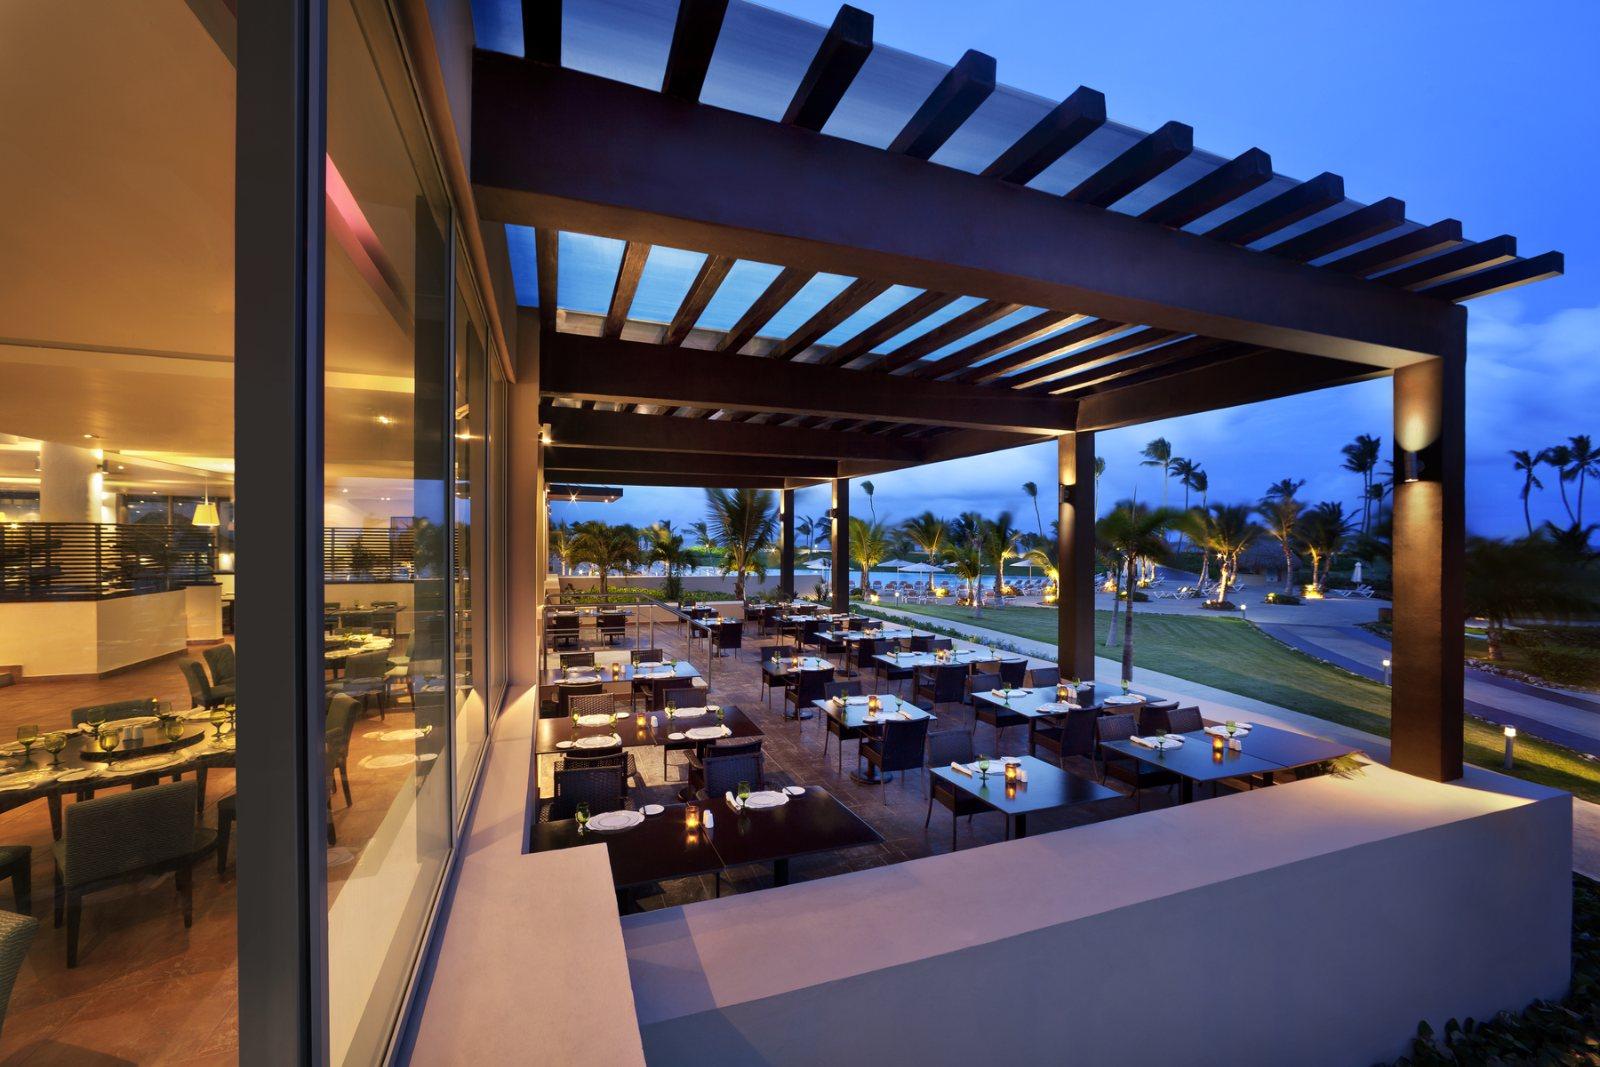 HRHC_Punta_Cana_Restaurant_Toro_Steakhouse